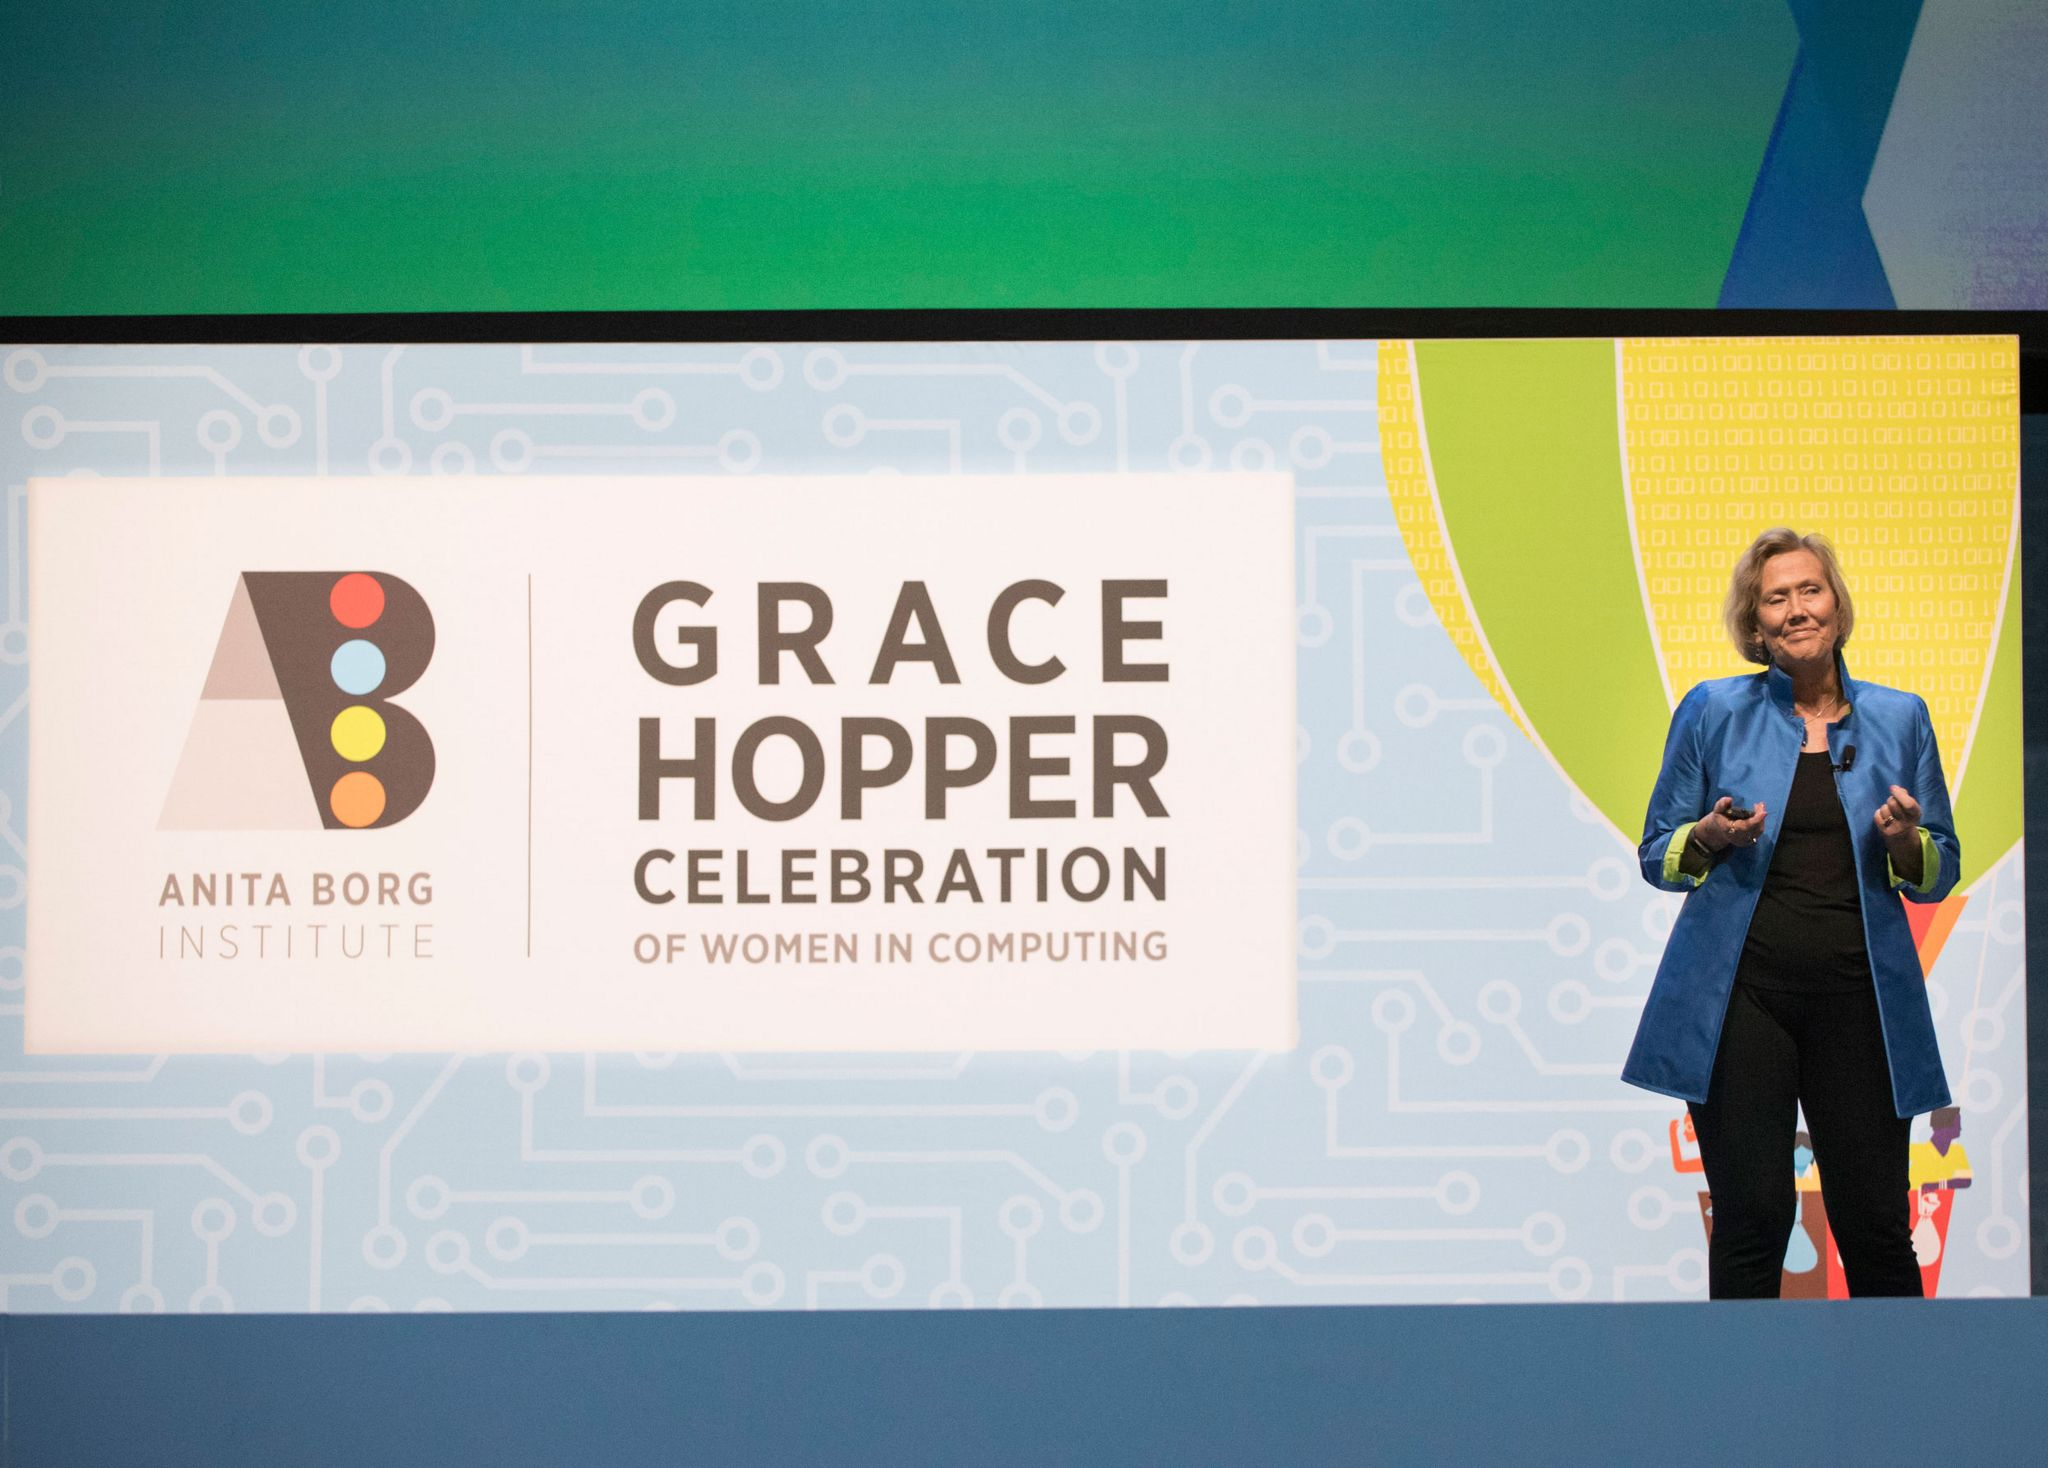 Telle Whitney, CEO and president of the Anita Borg Institute, co-founder of the Grace Hopper Celebration